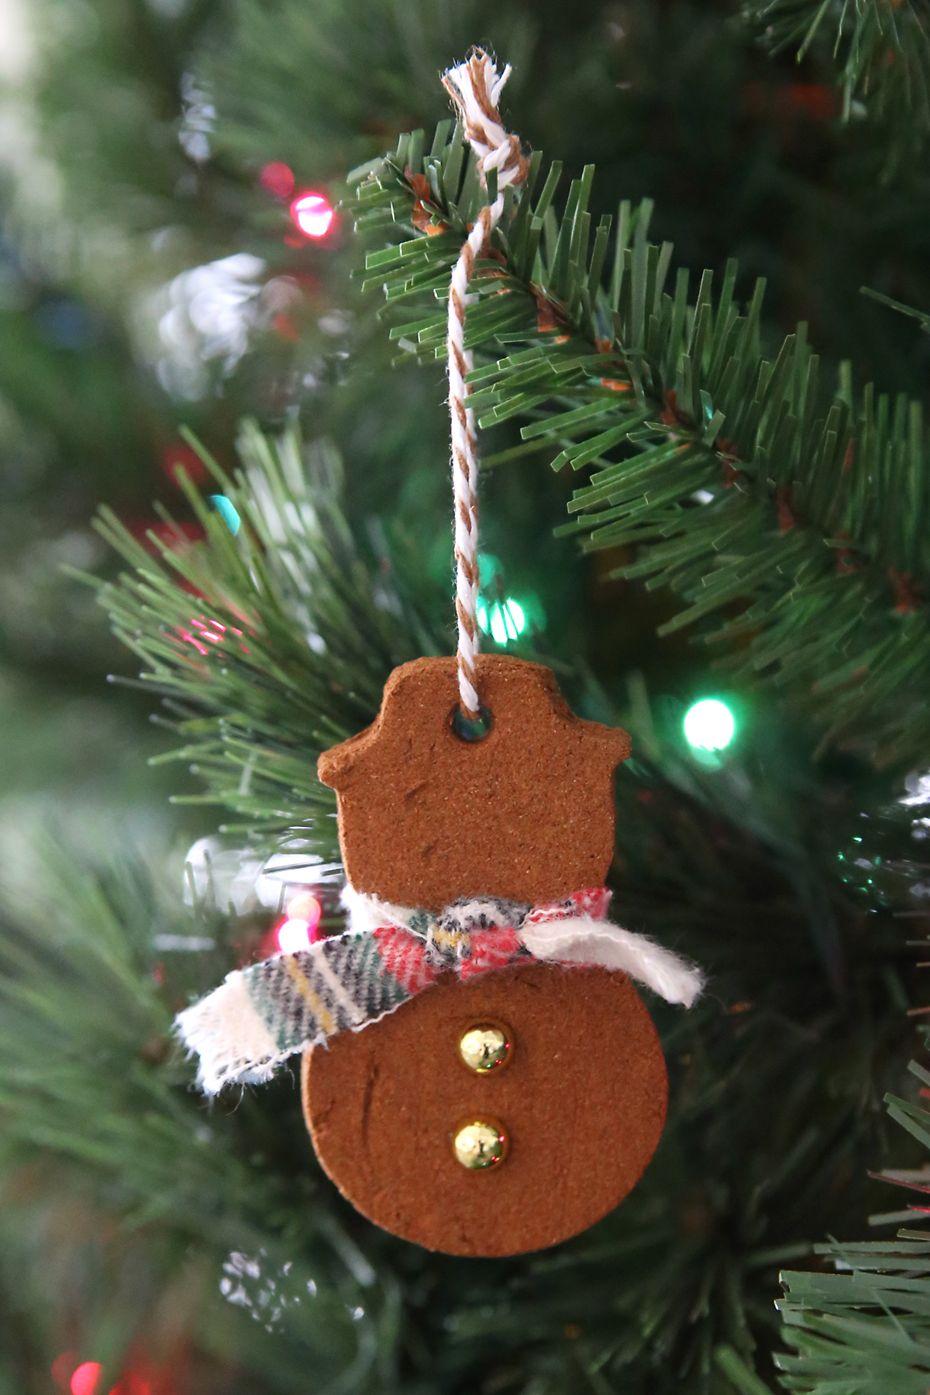 Gingerbread Snowman Christmas Ornament